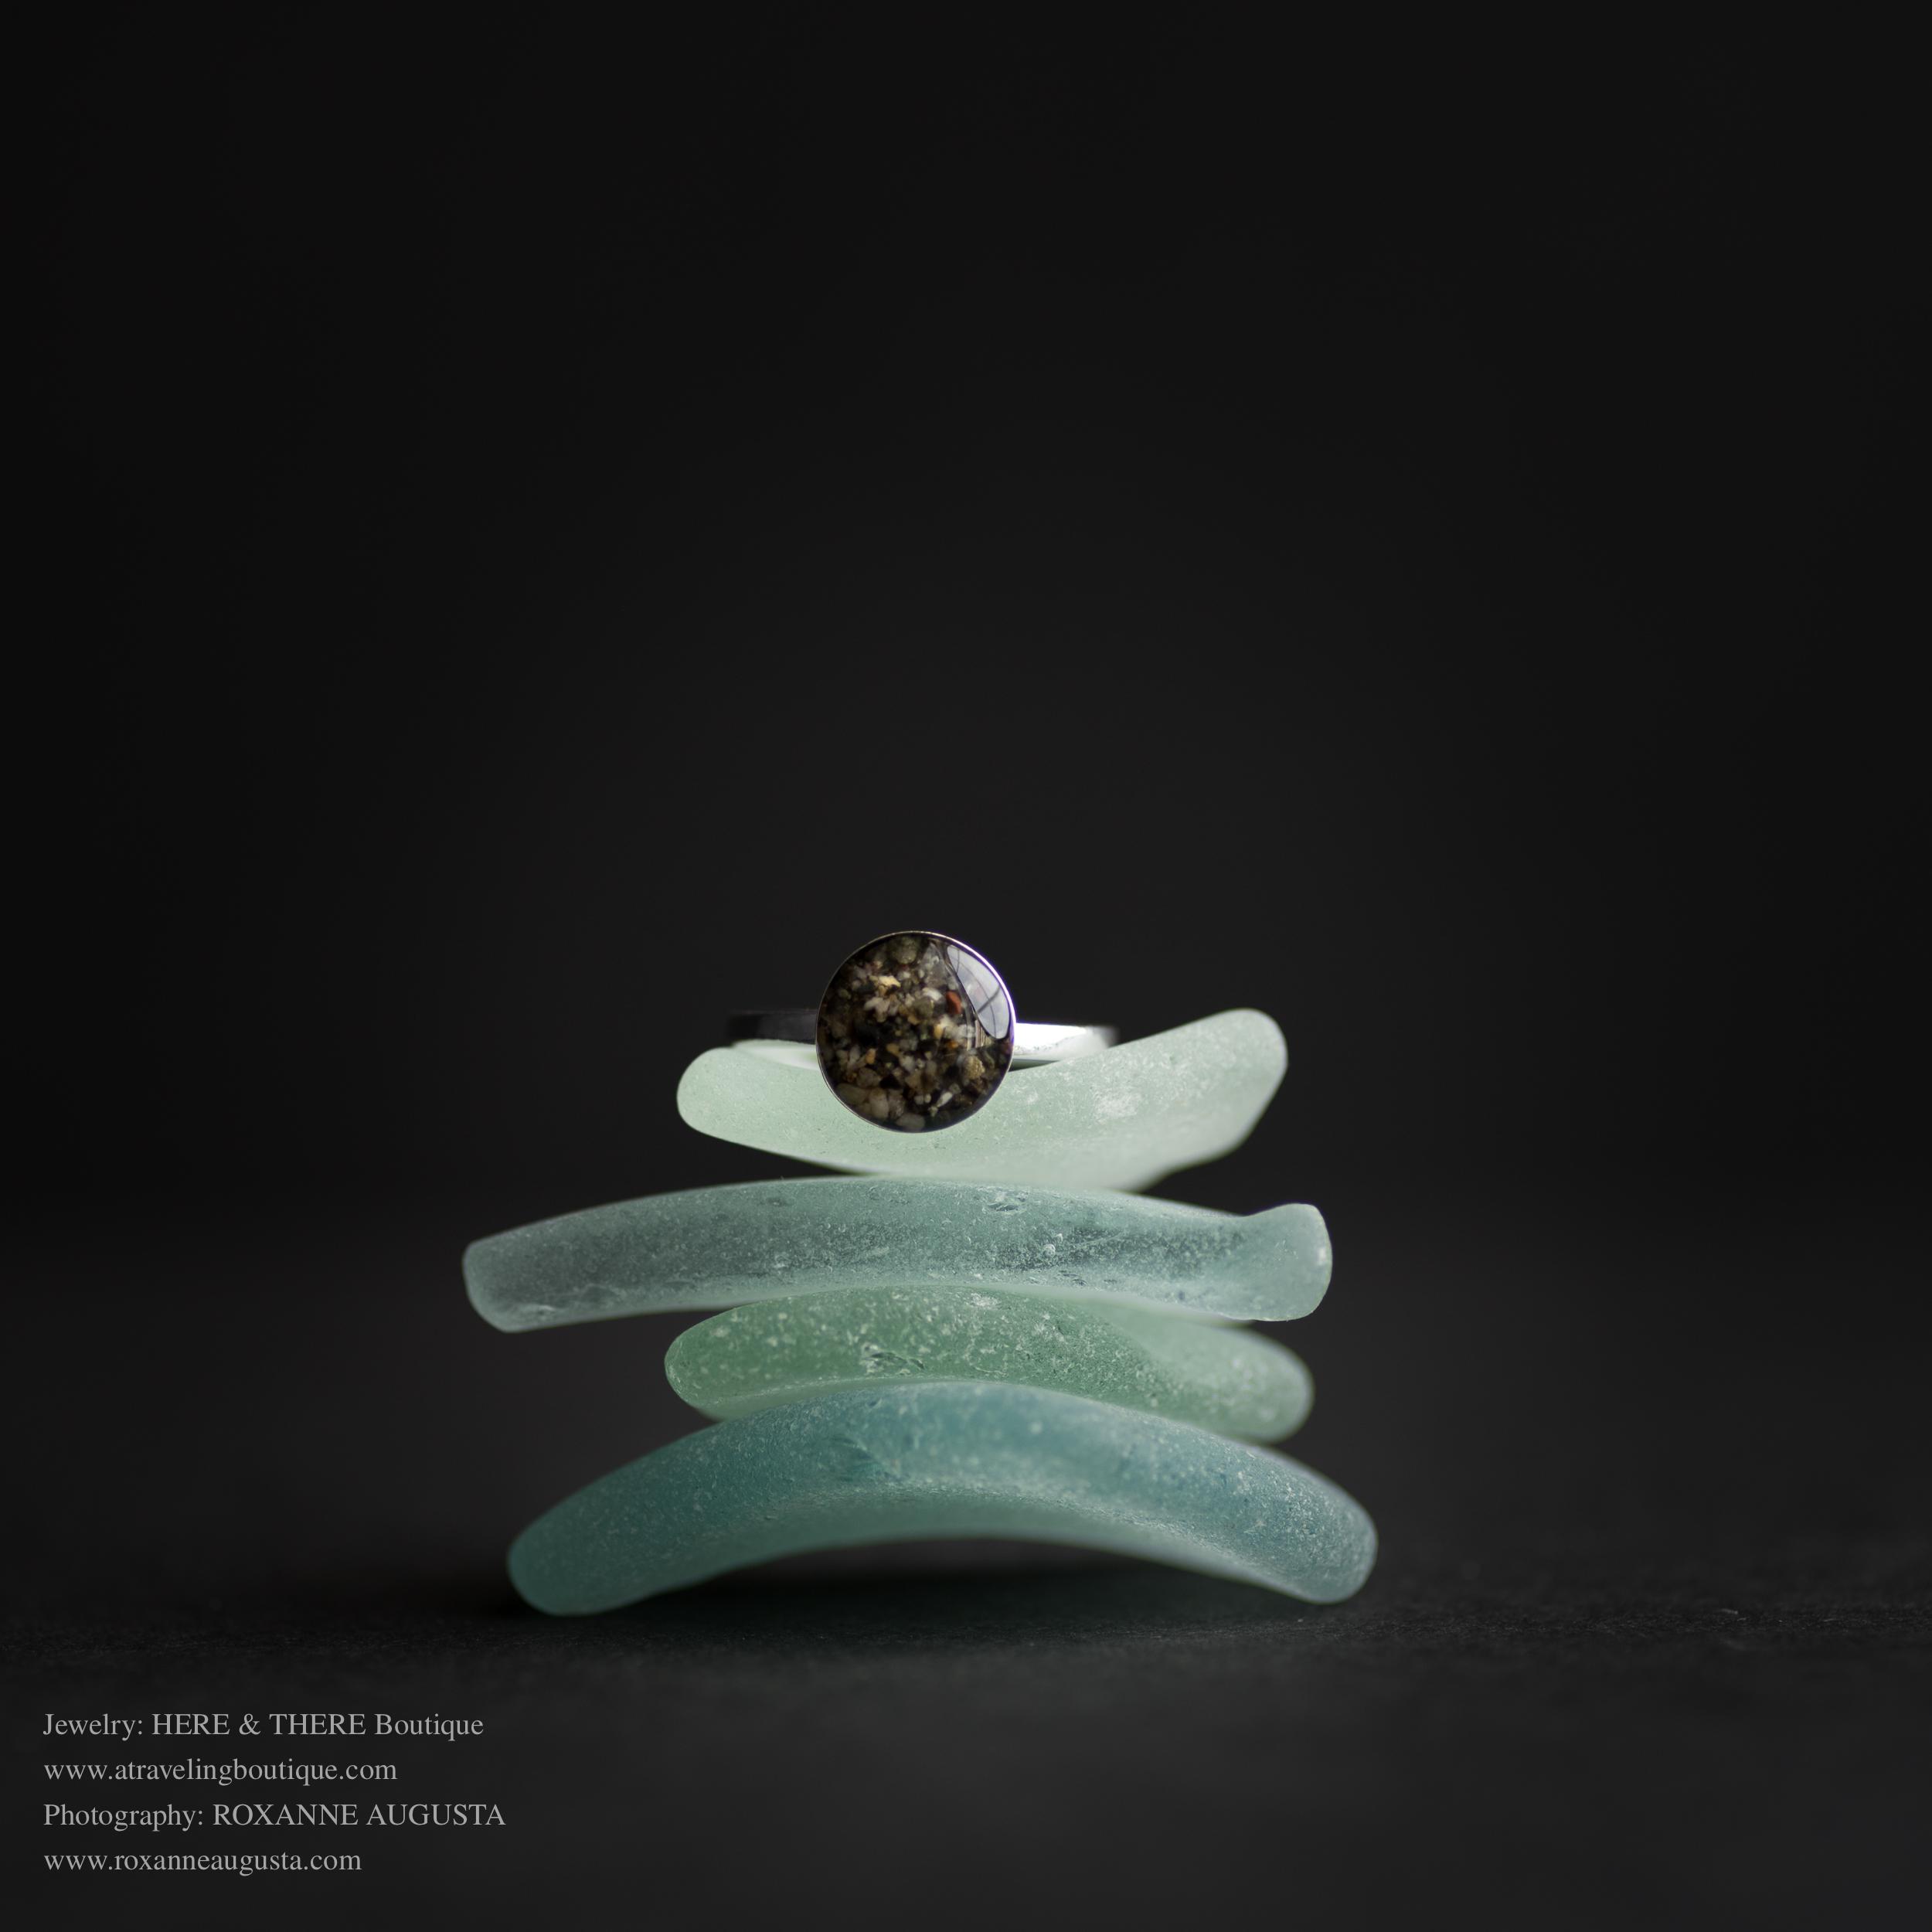 H&TJewelryProductPhotography-ROXANNEAUGUSTA-4.jpg